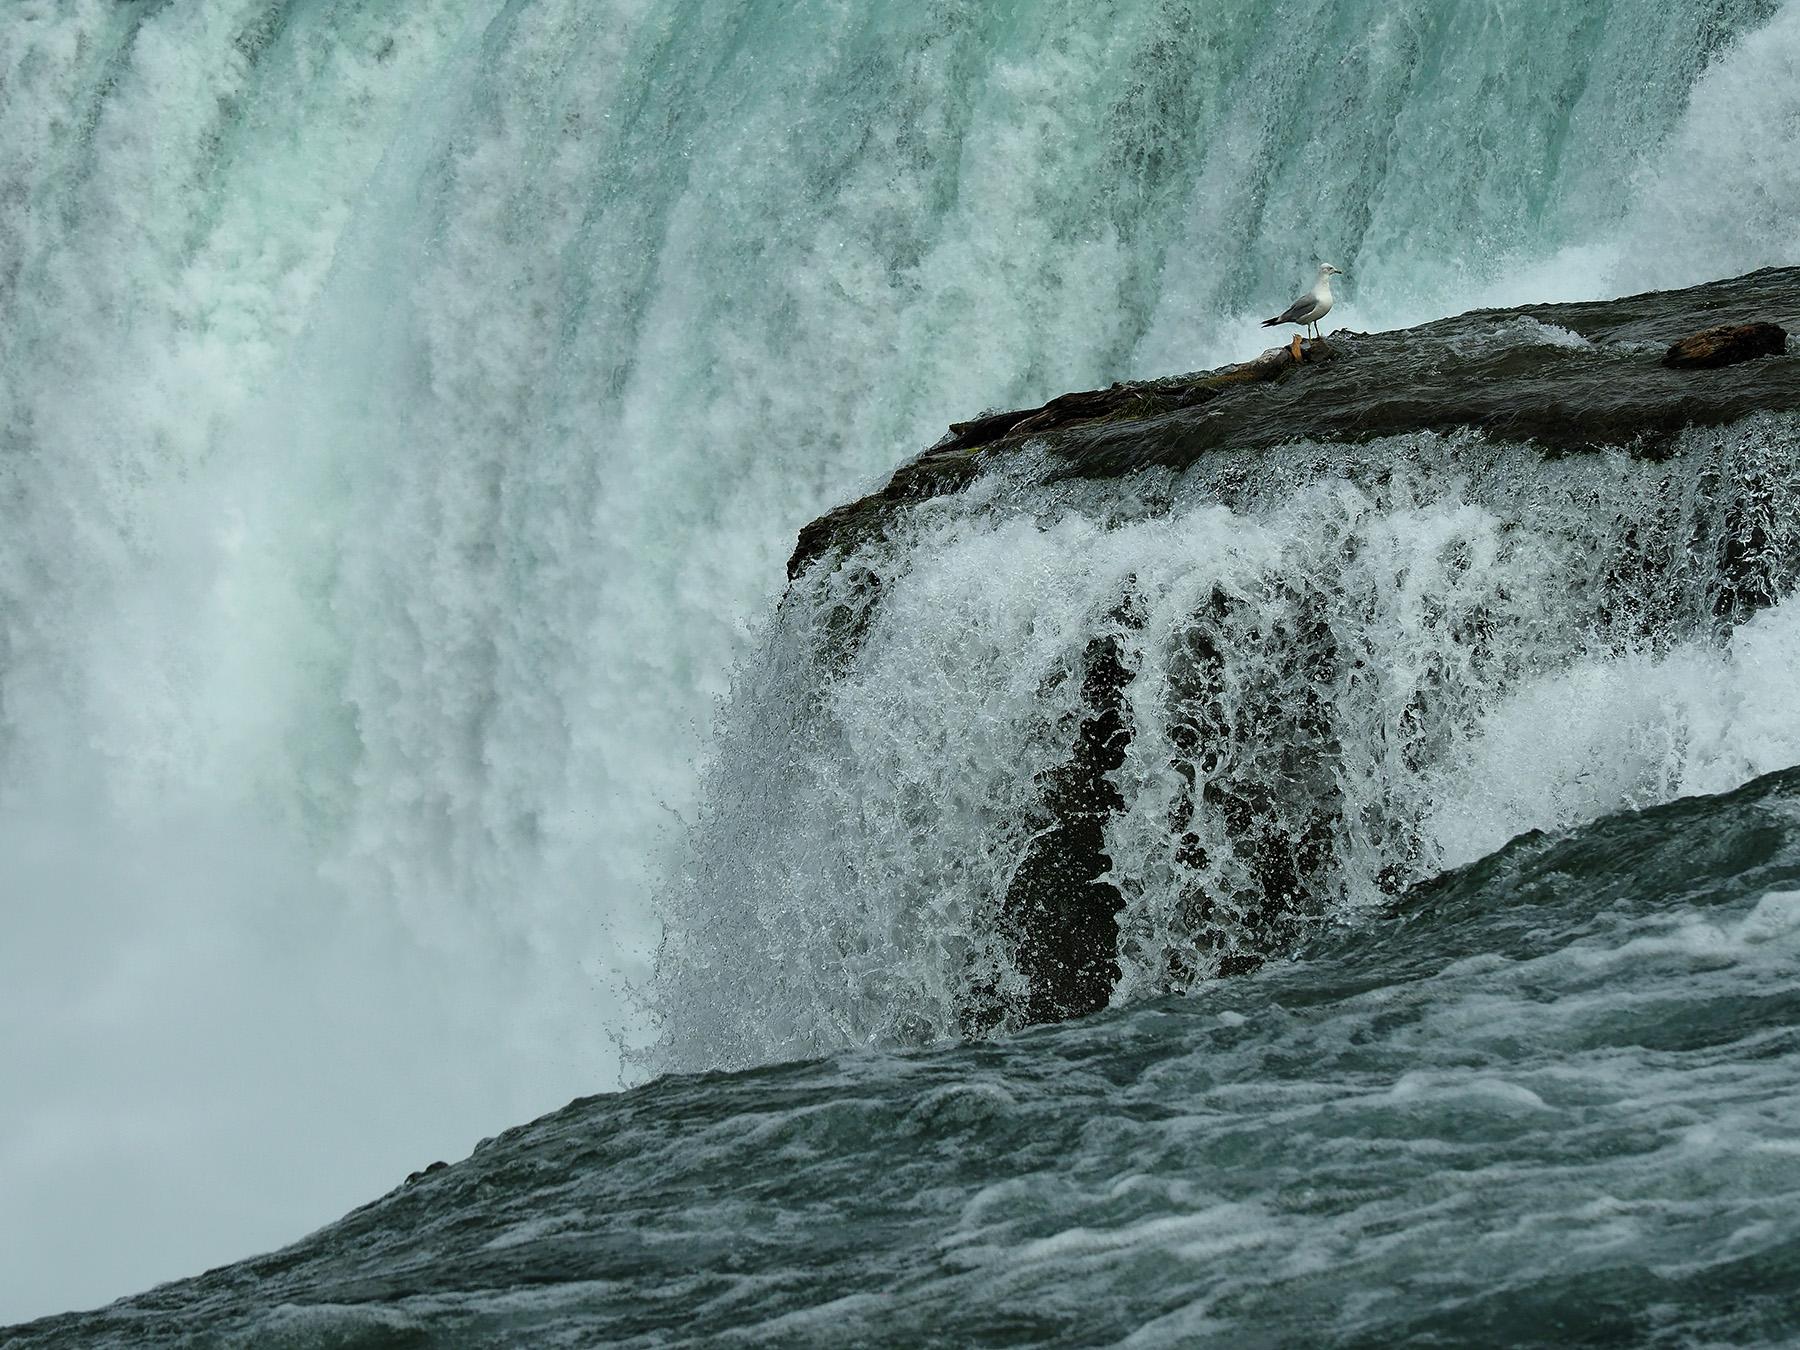 Ranjan_Ramchandani_A birs eye view of Niagara falls.jpg